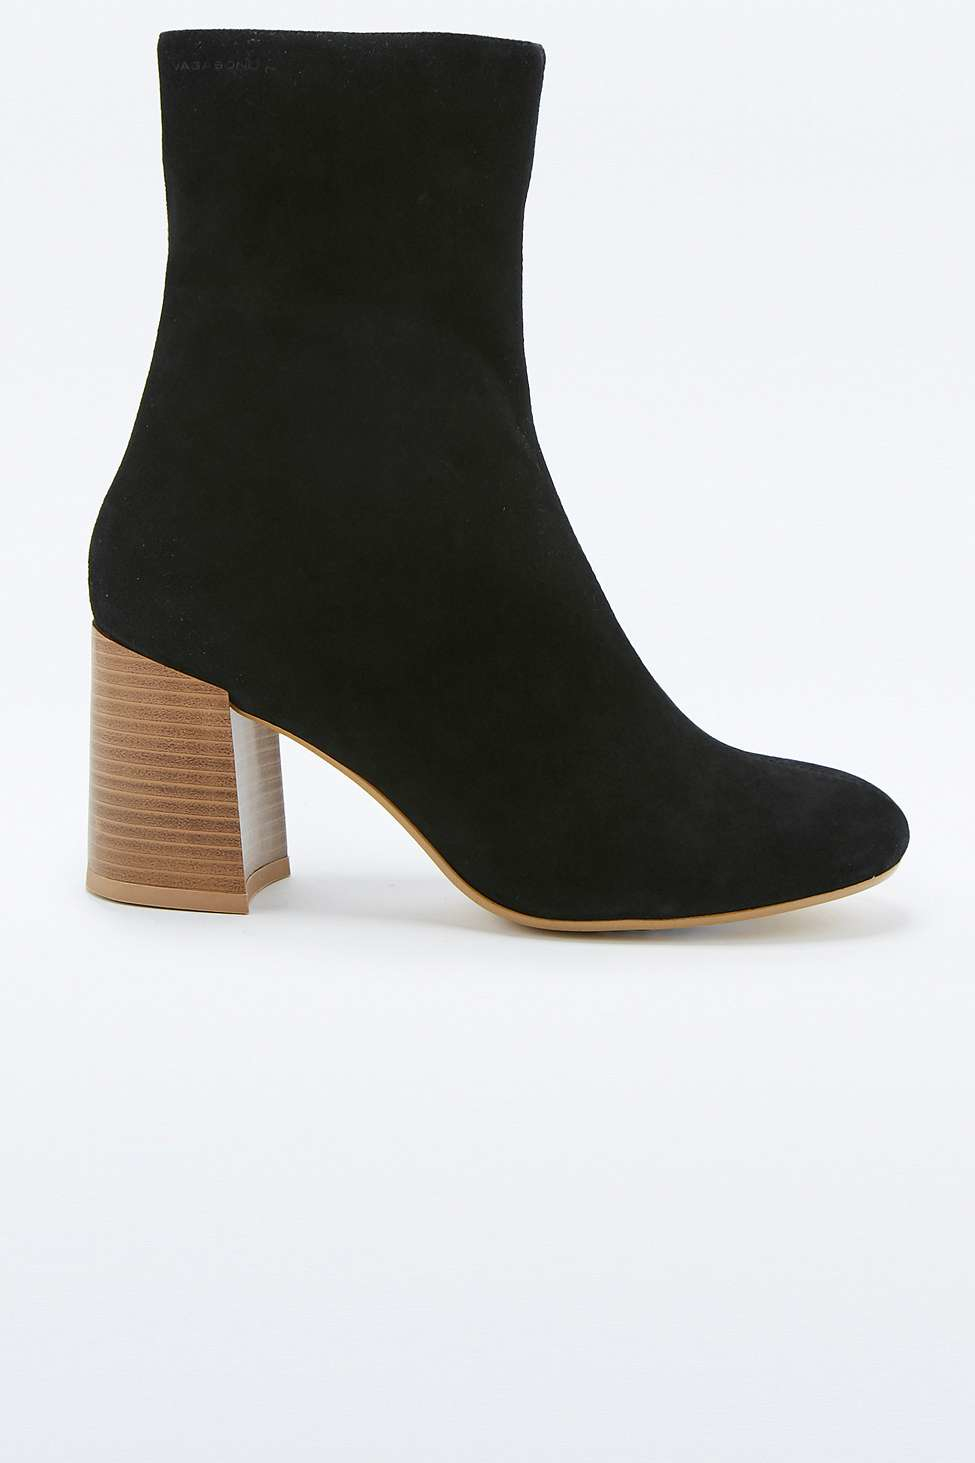 Vagabond Kaley Black Suede Calf Boots